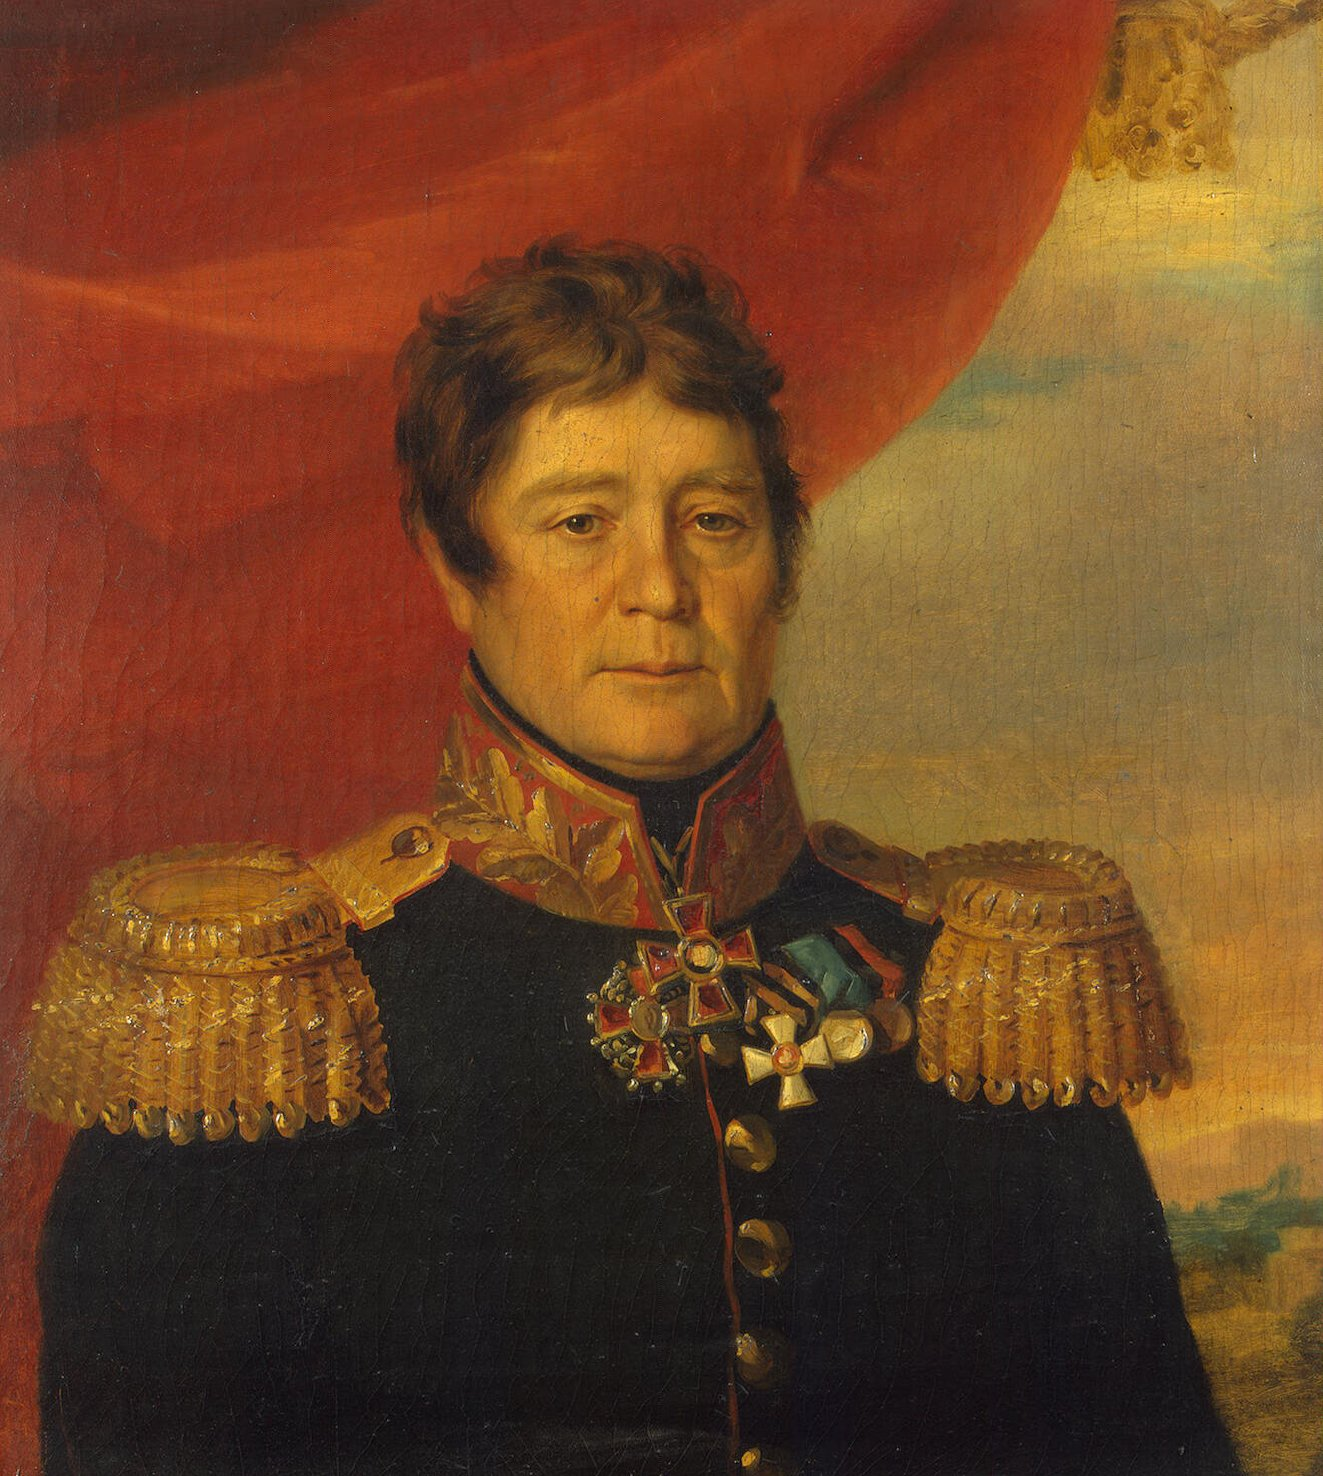 Дятков, Степан Васильевич